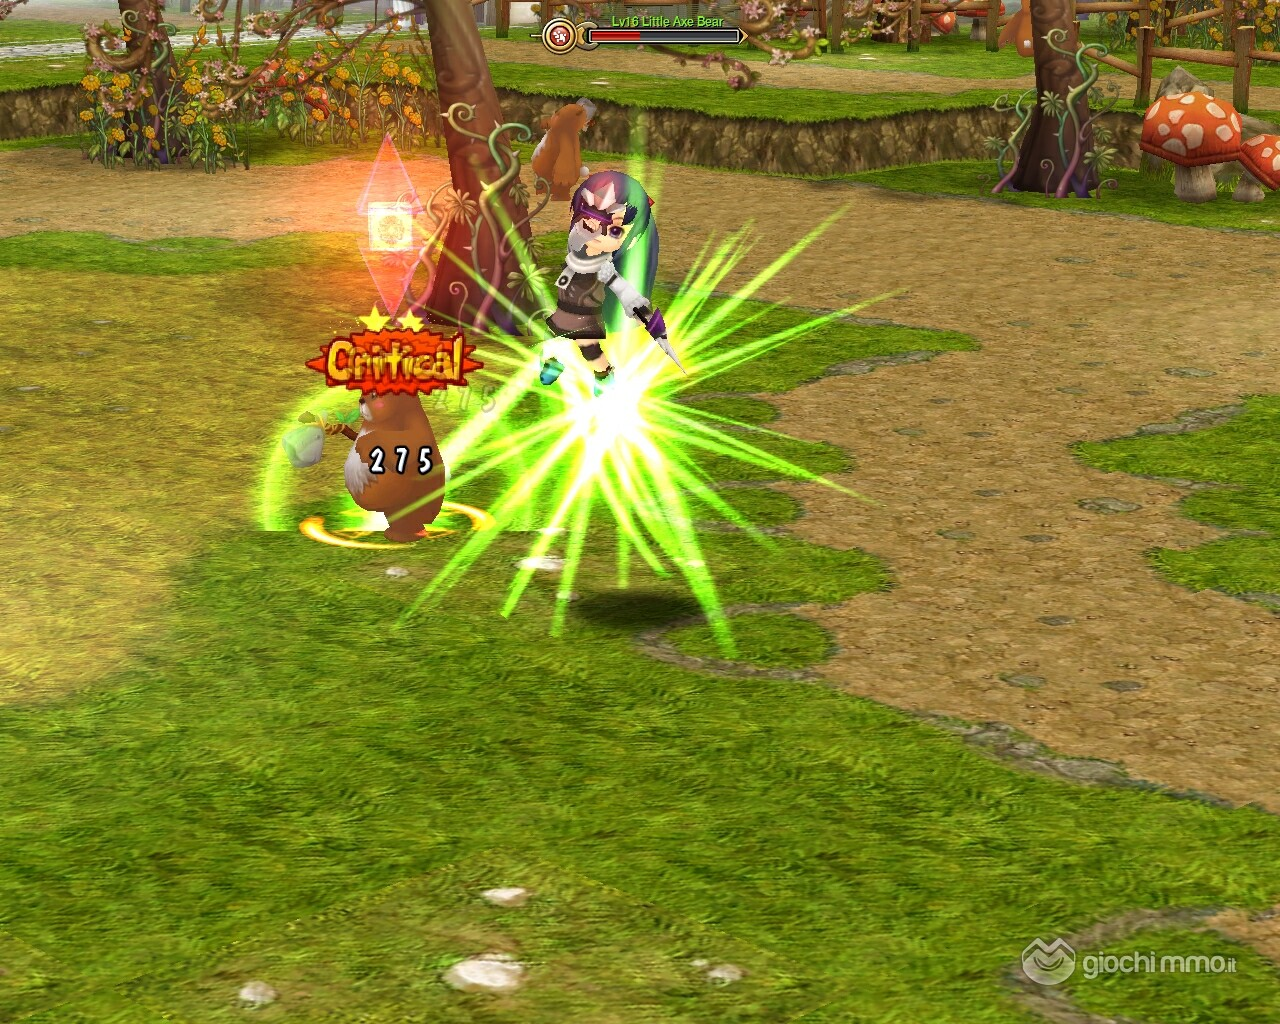 Clicca sull'immagine per ingrandirlaNome: Legend of edda screen08.jpgVisite: 56Dimensione: 450.9 KBID: 8524